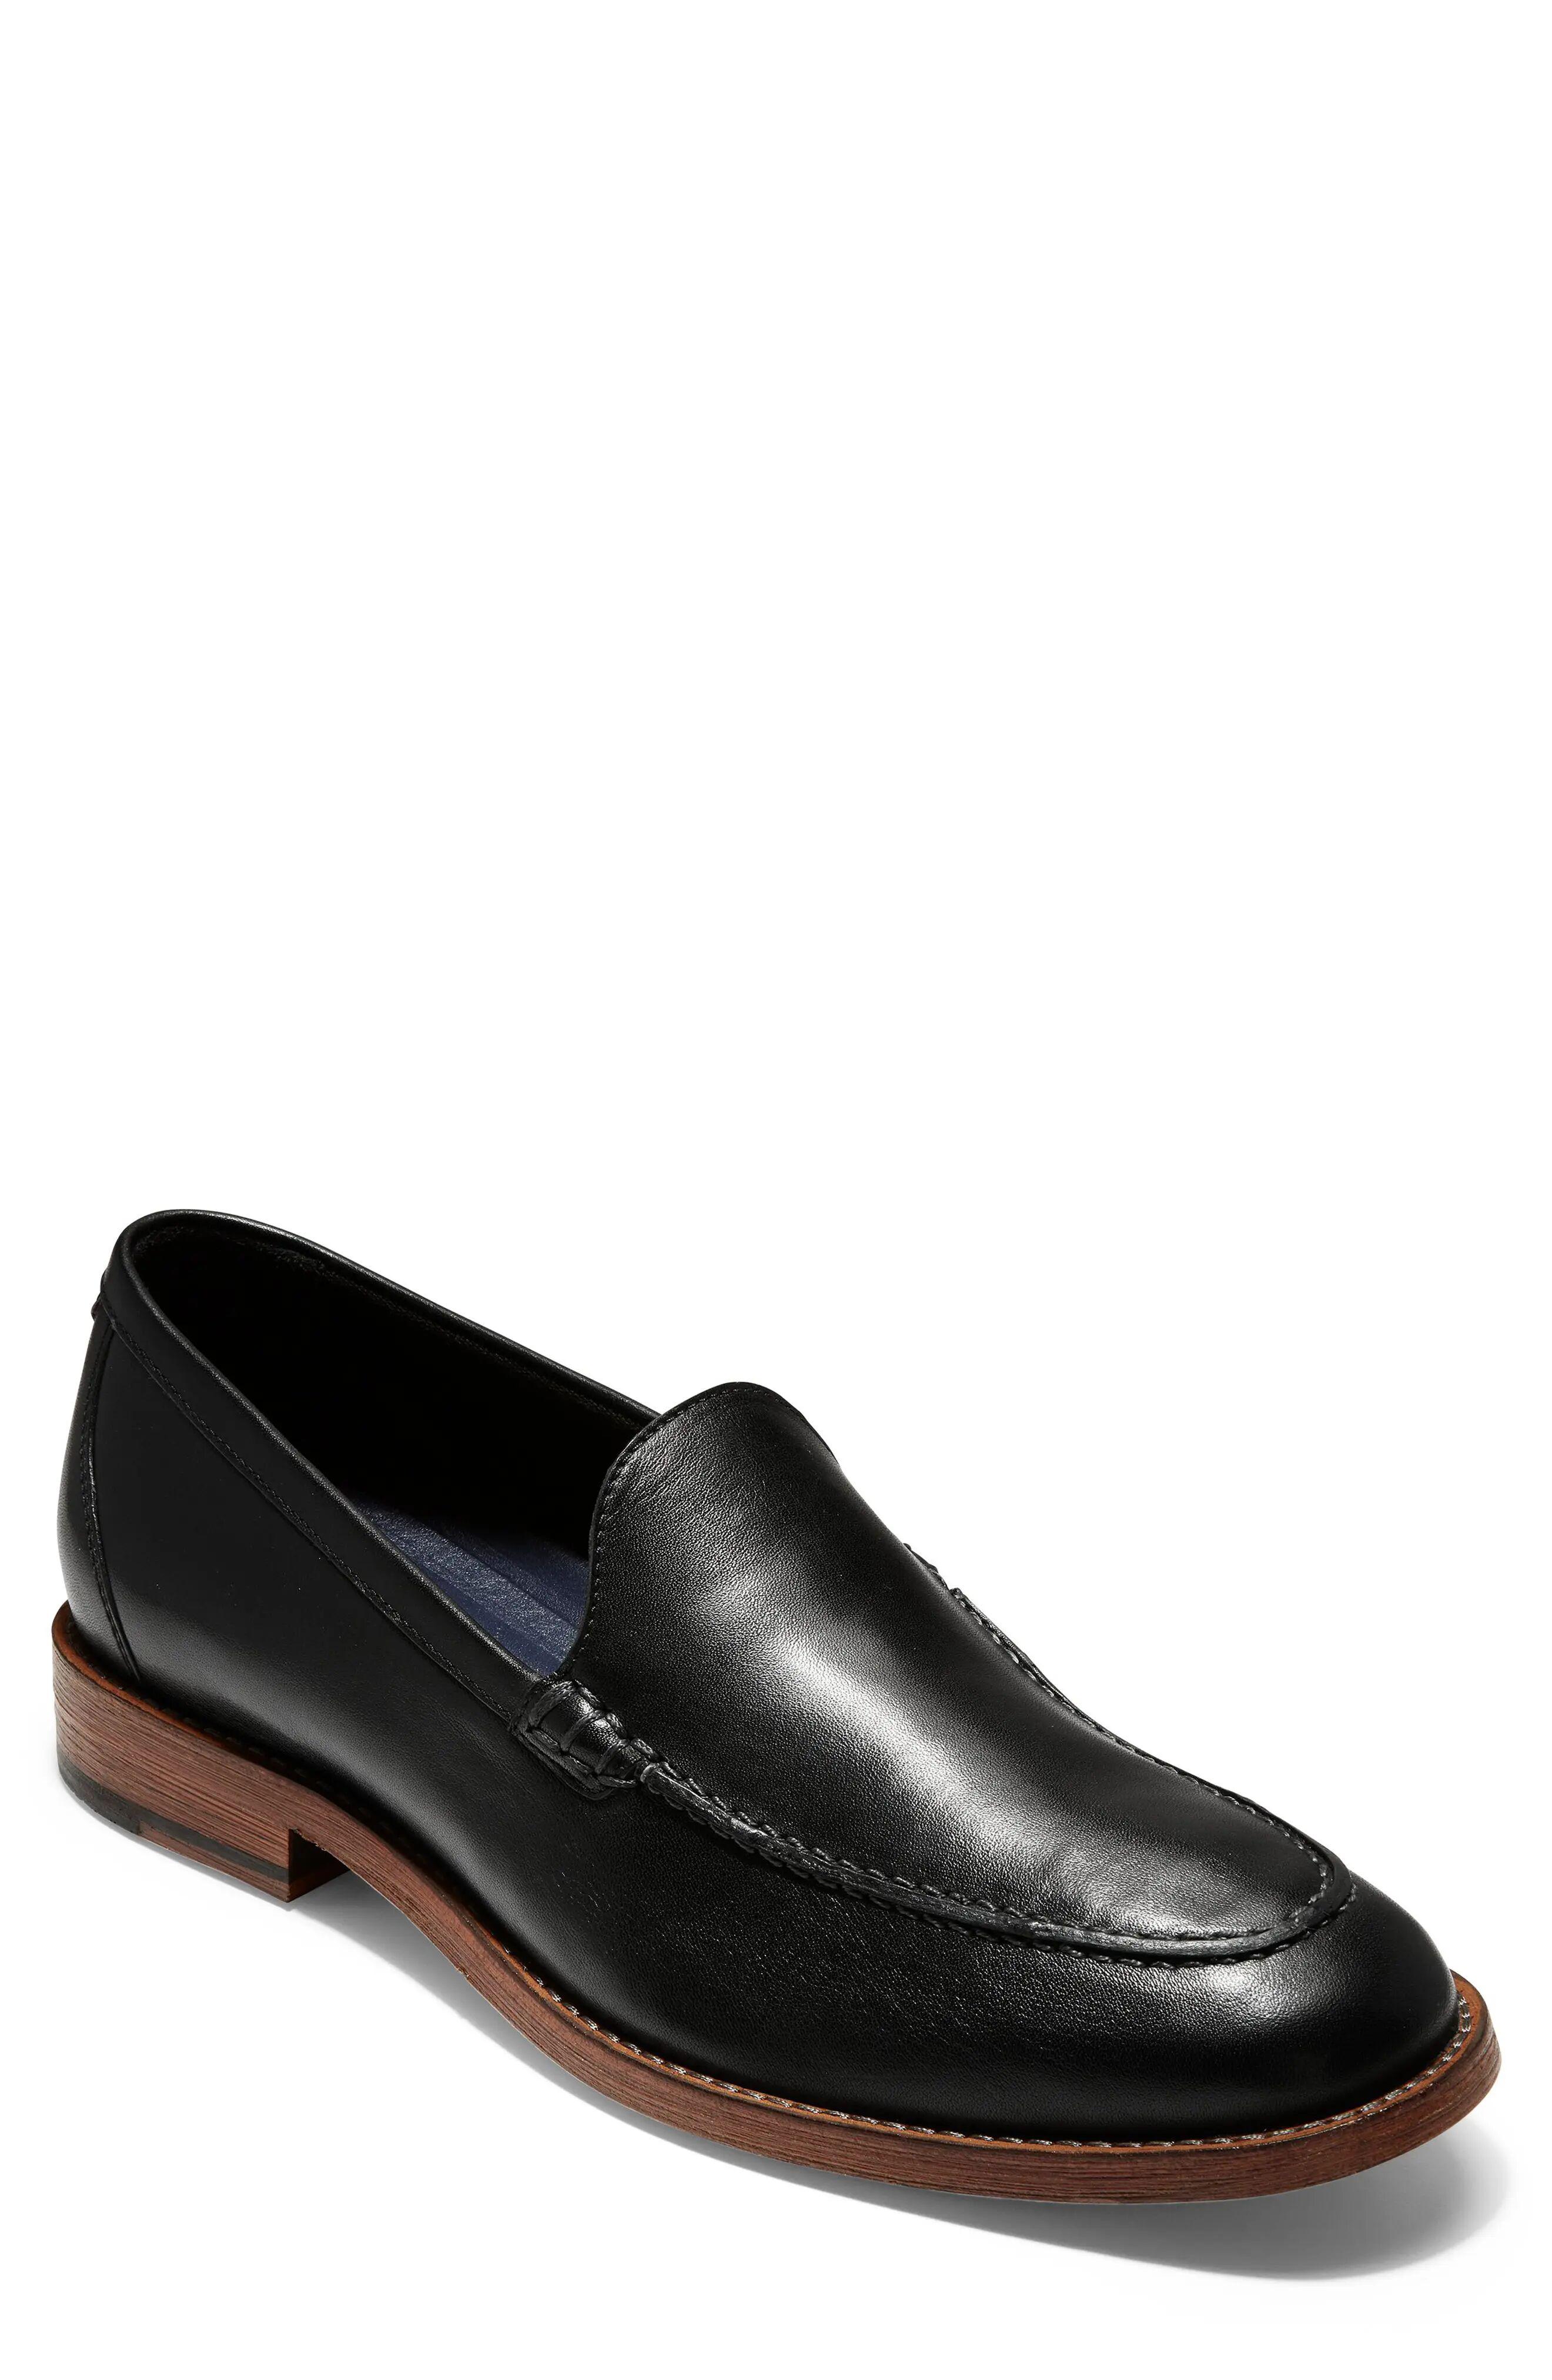 Cole Haan Men's Cole Haan Feathercraft Grand Venetian Loafer, Size 11 M - Black